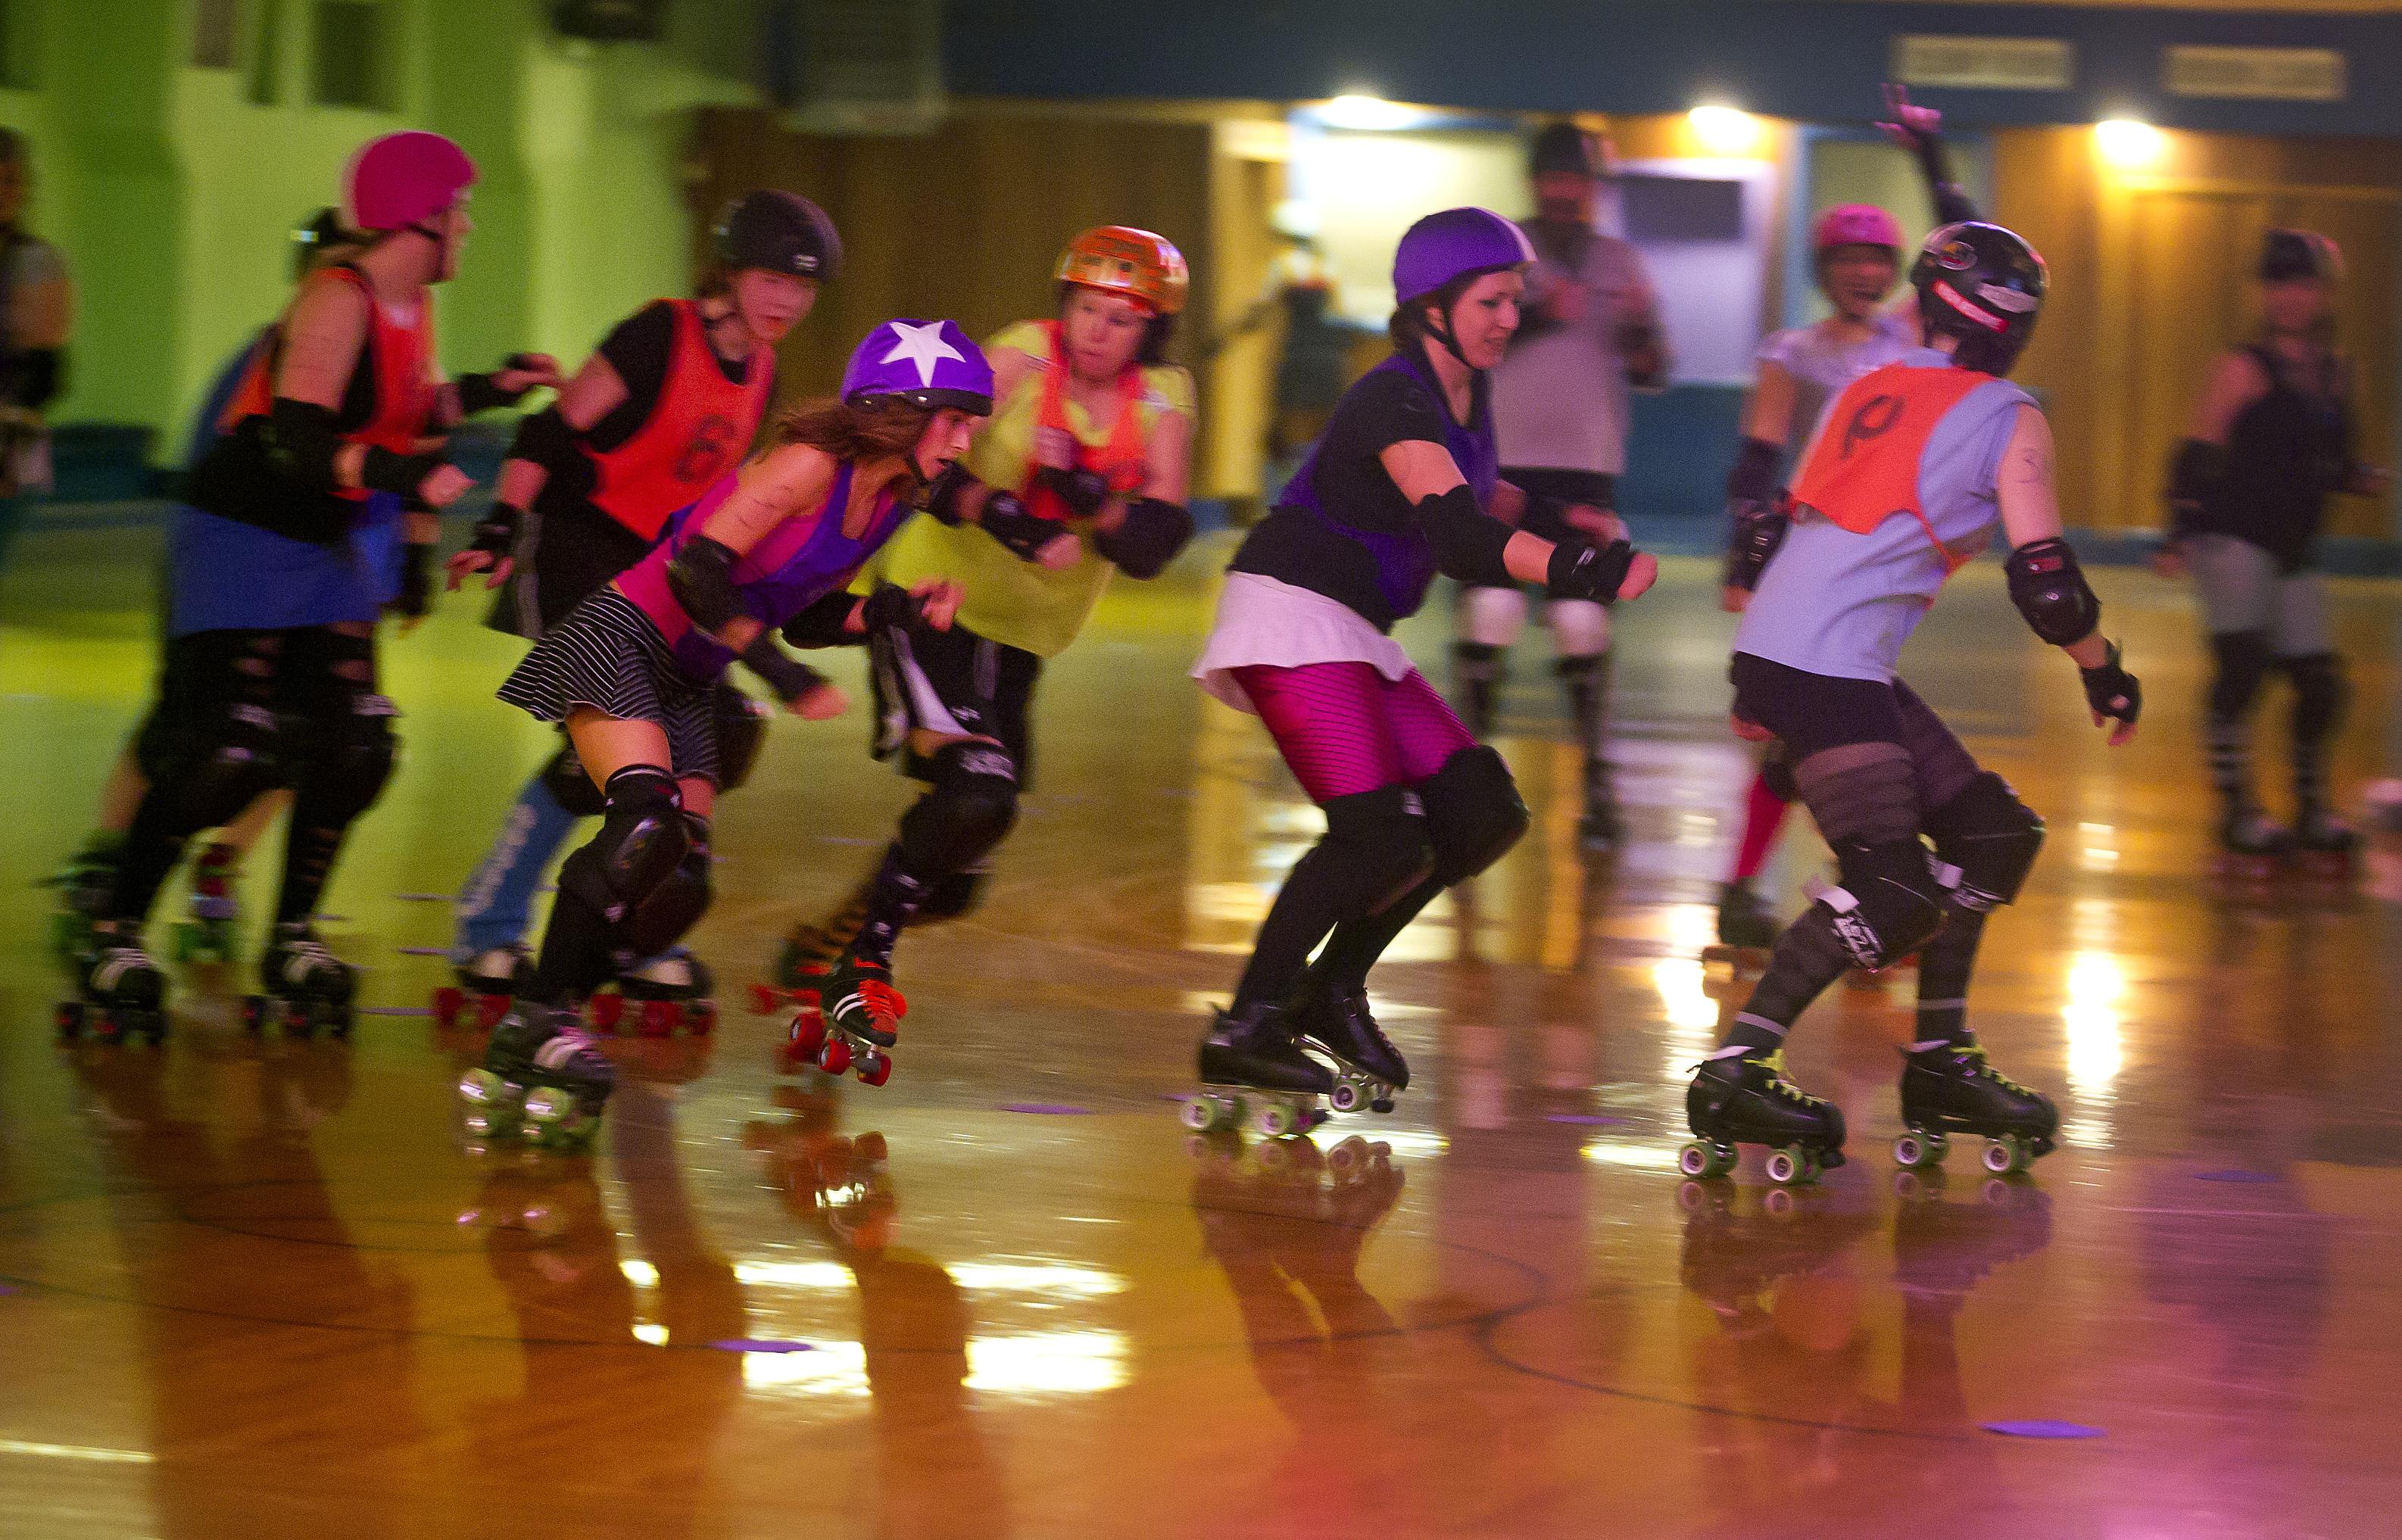 Roller skating rink quad cities - Roller Skating Rink Quad Cities 4